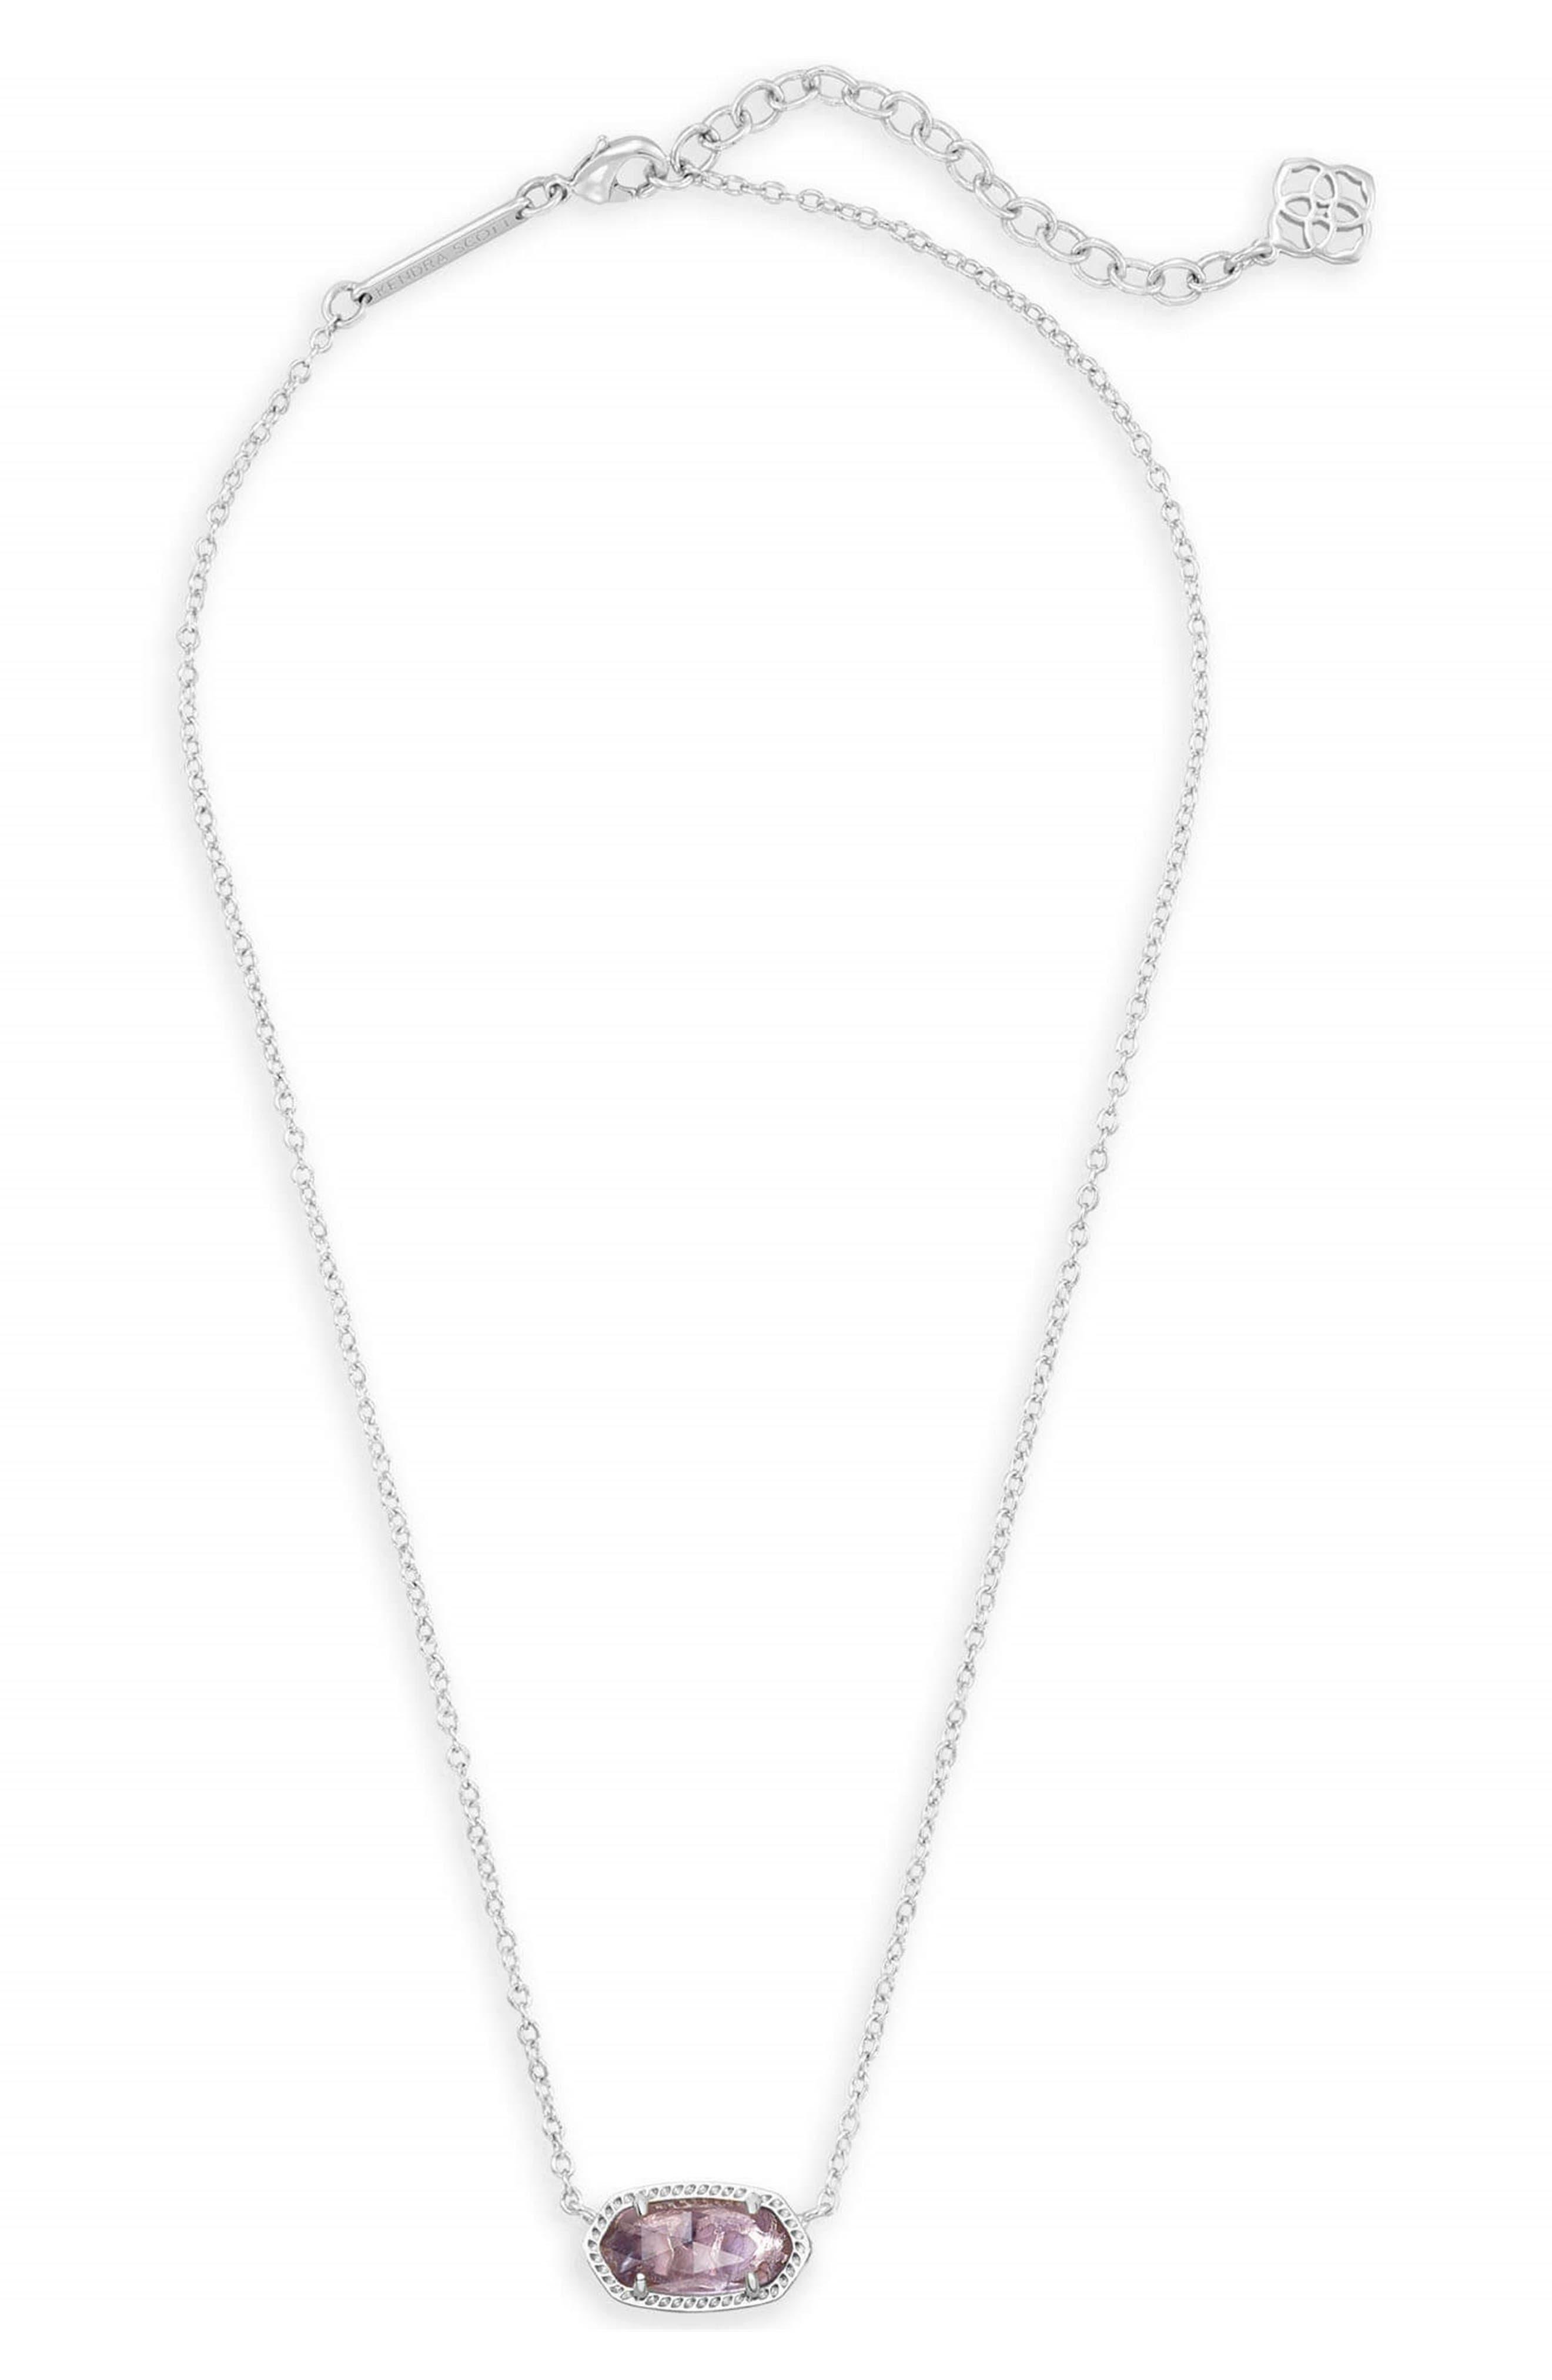 KENDRA SCOTT Elisa Birthstone Pendant Necklace, Main, color, FEBRUARY/AMETHYST/SILVER